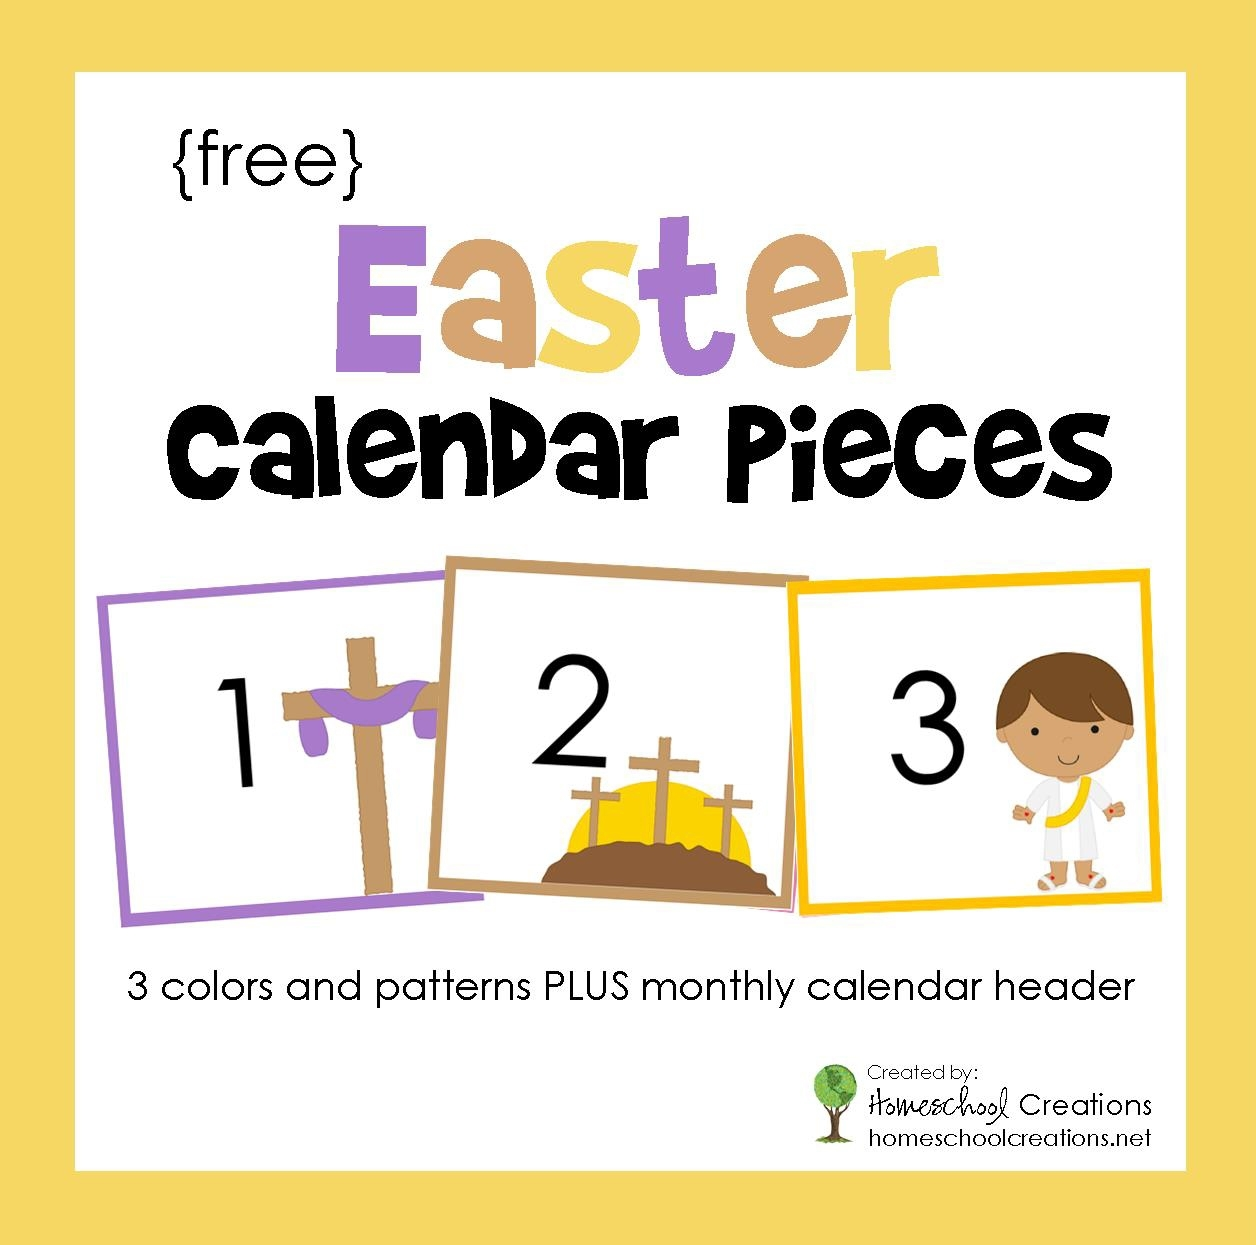 Easter Pocket Chart Calendar Pieces - Free Printable